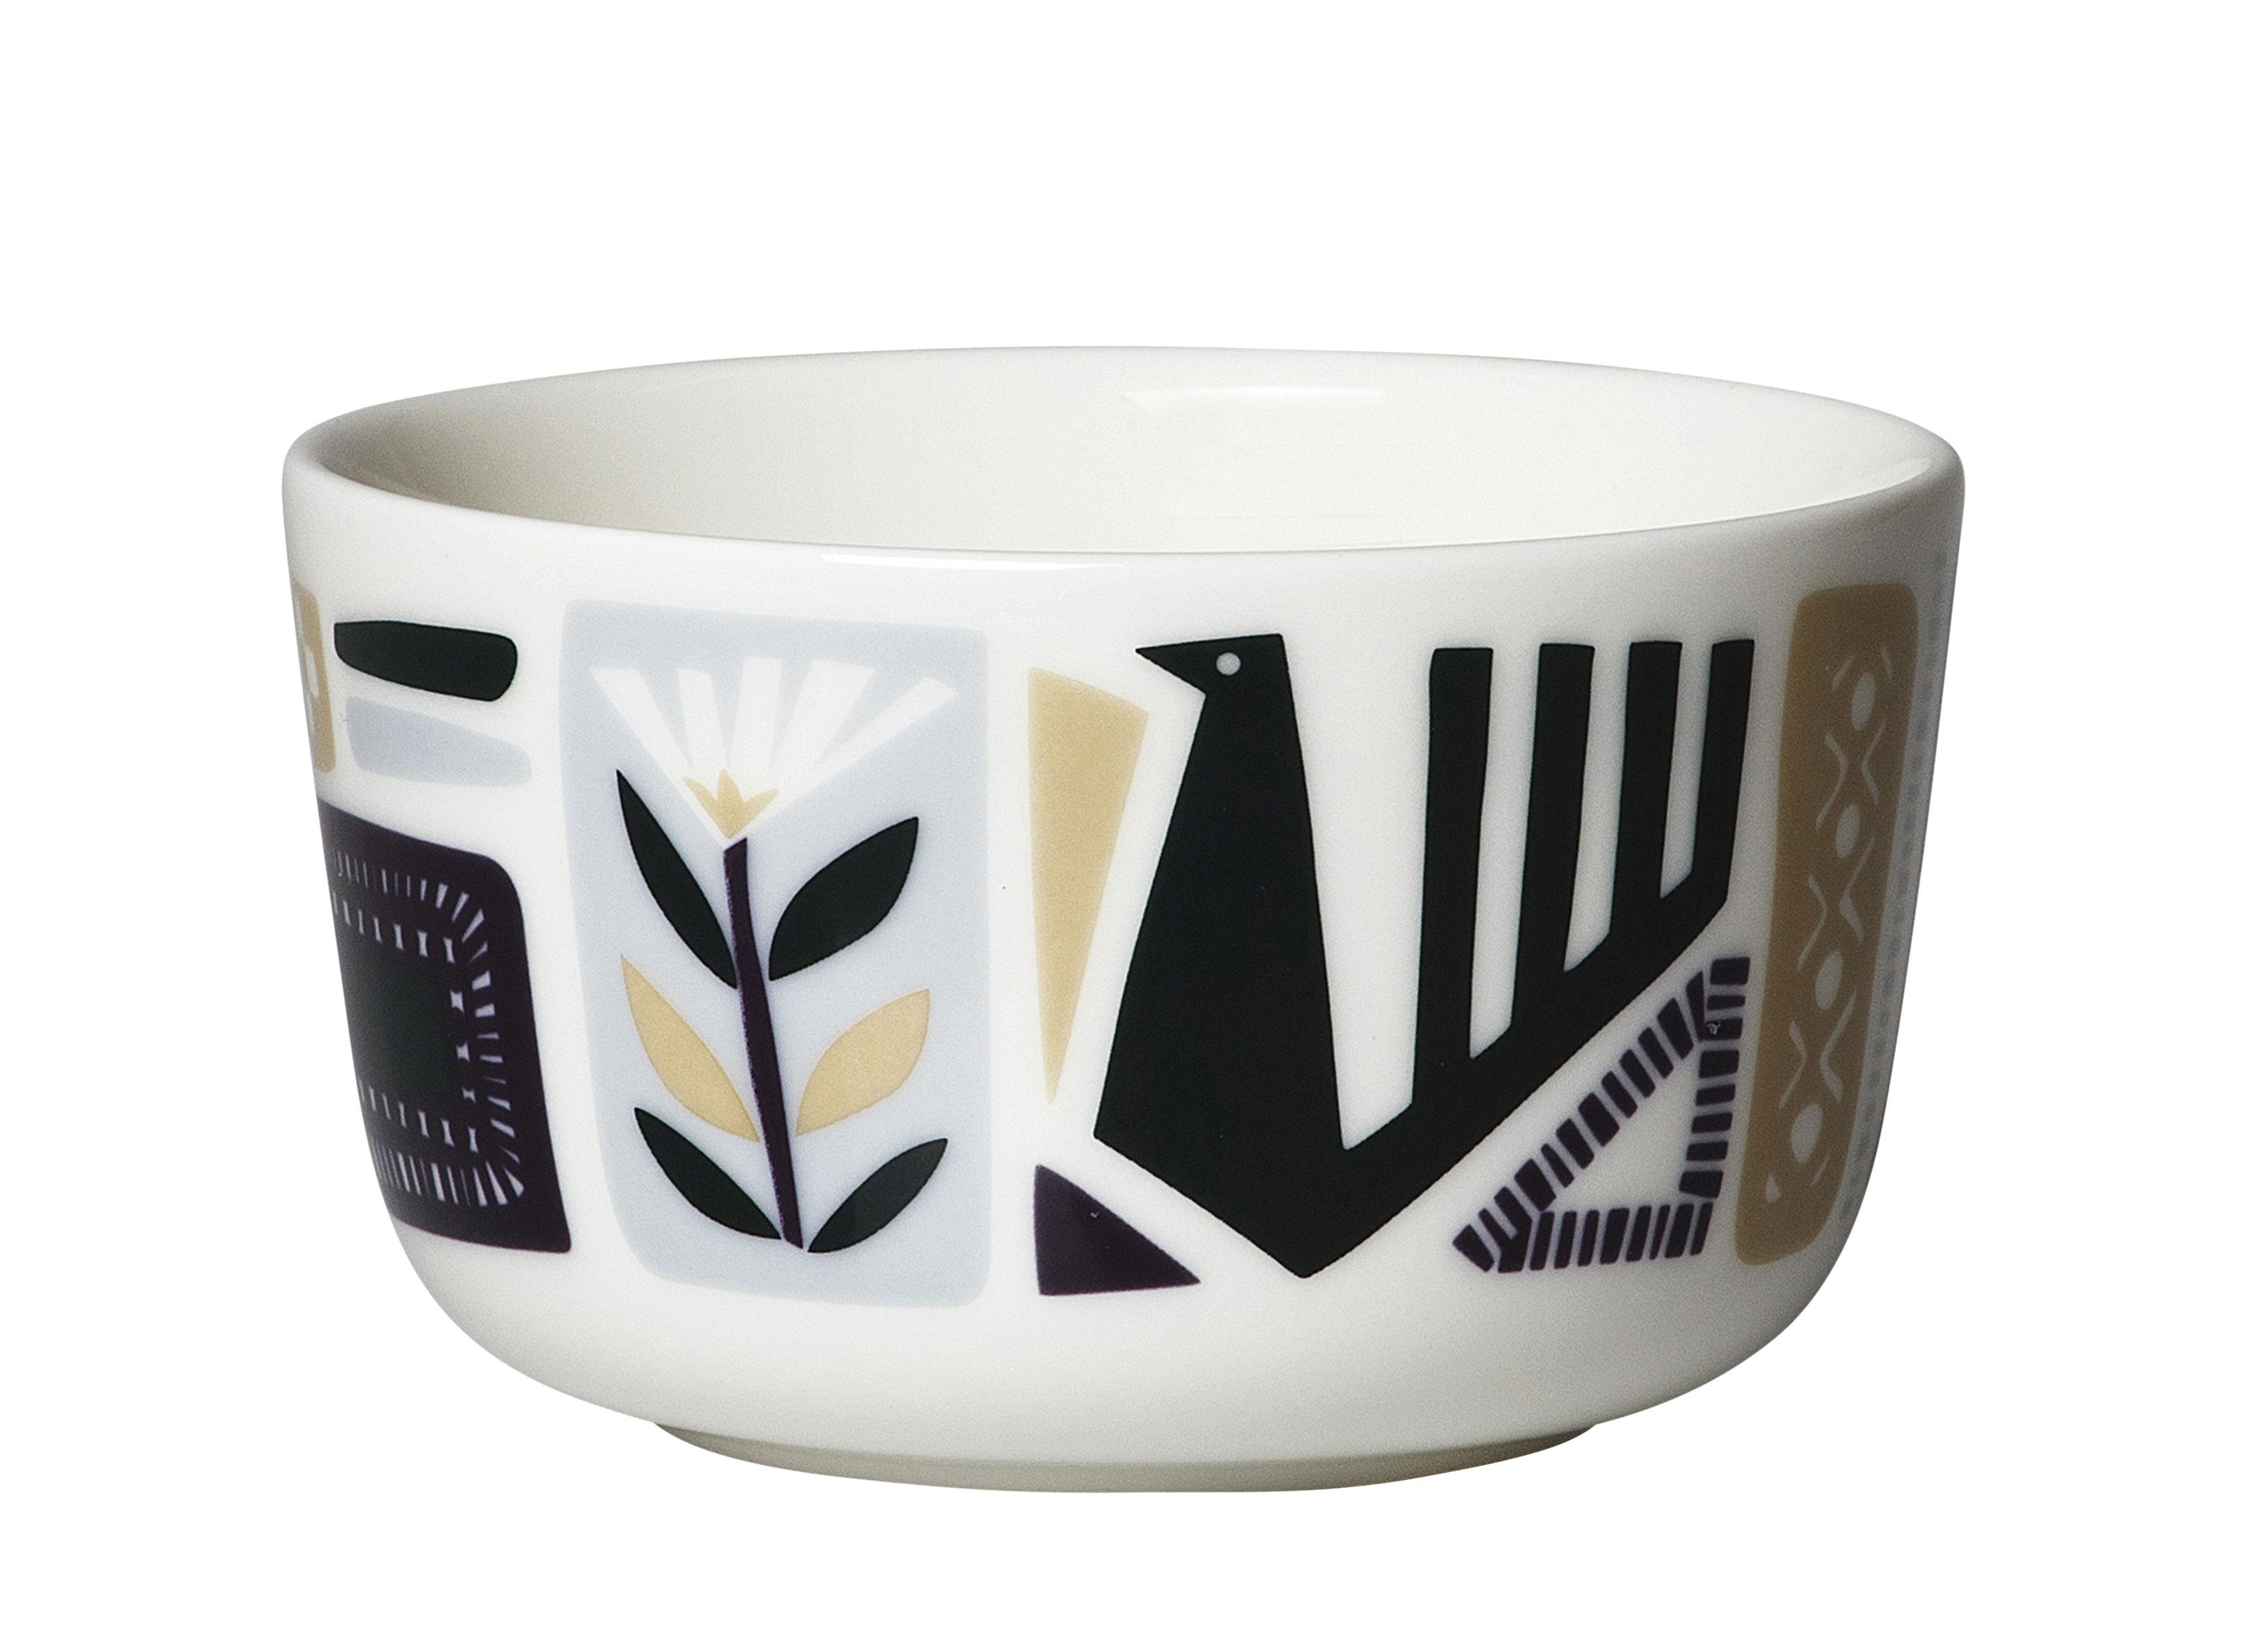 Tavola - Ciotole - Ciotola Svaale - / Ø 9,5 cm di Marimekko - Svaale / Multicolore - Gres